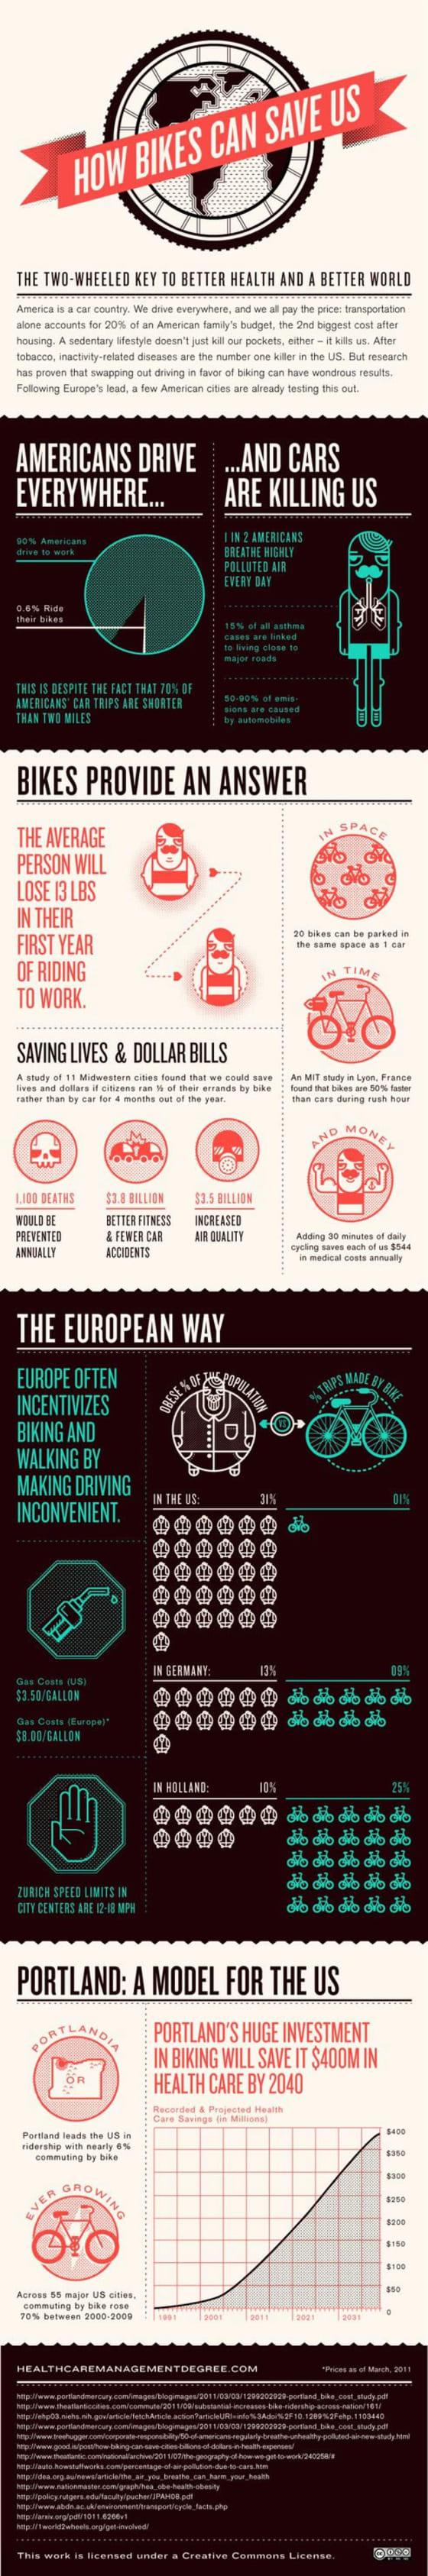 biking-and-health